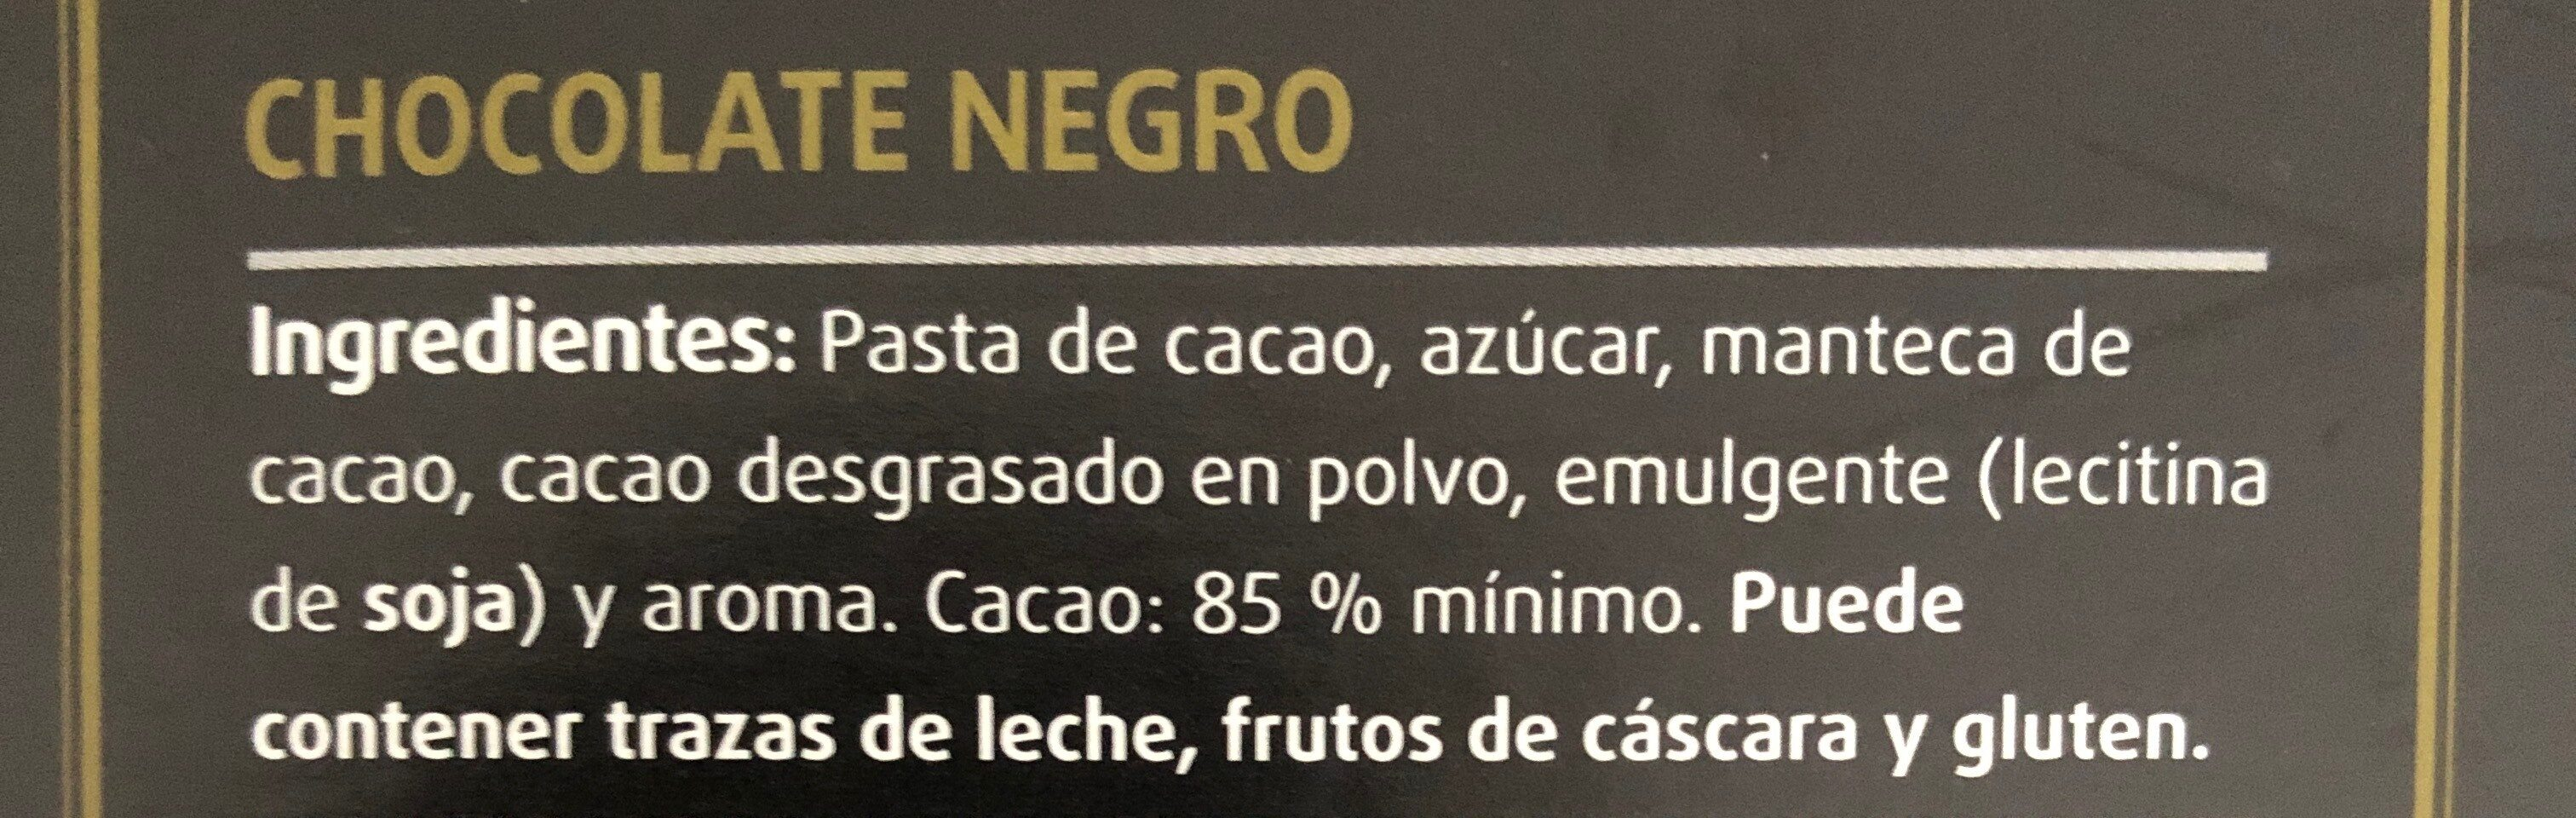 Chocolate negro - Ingredients - es